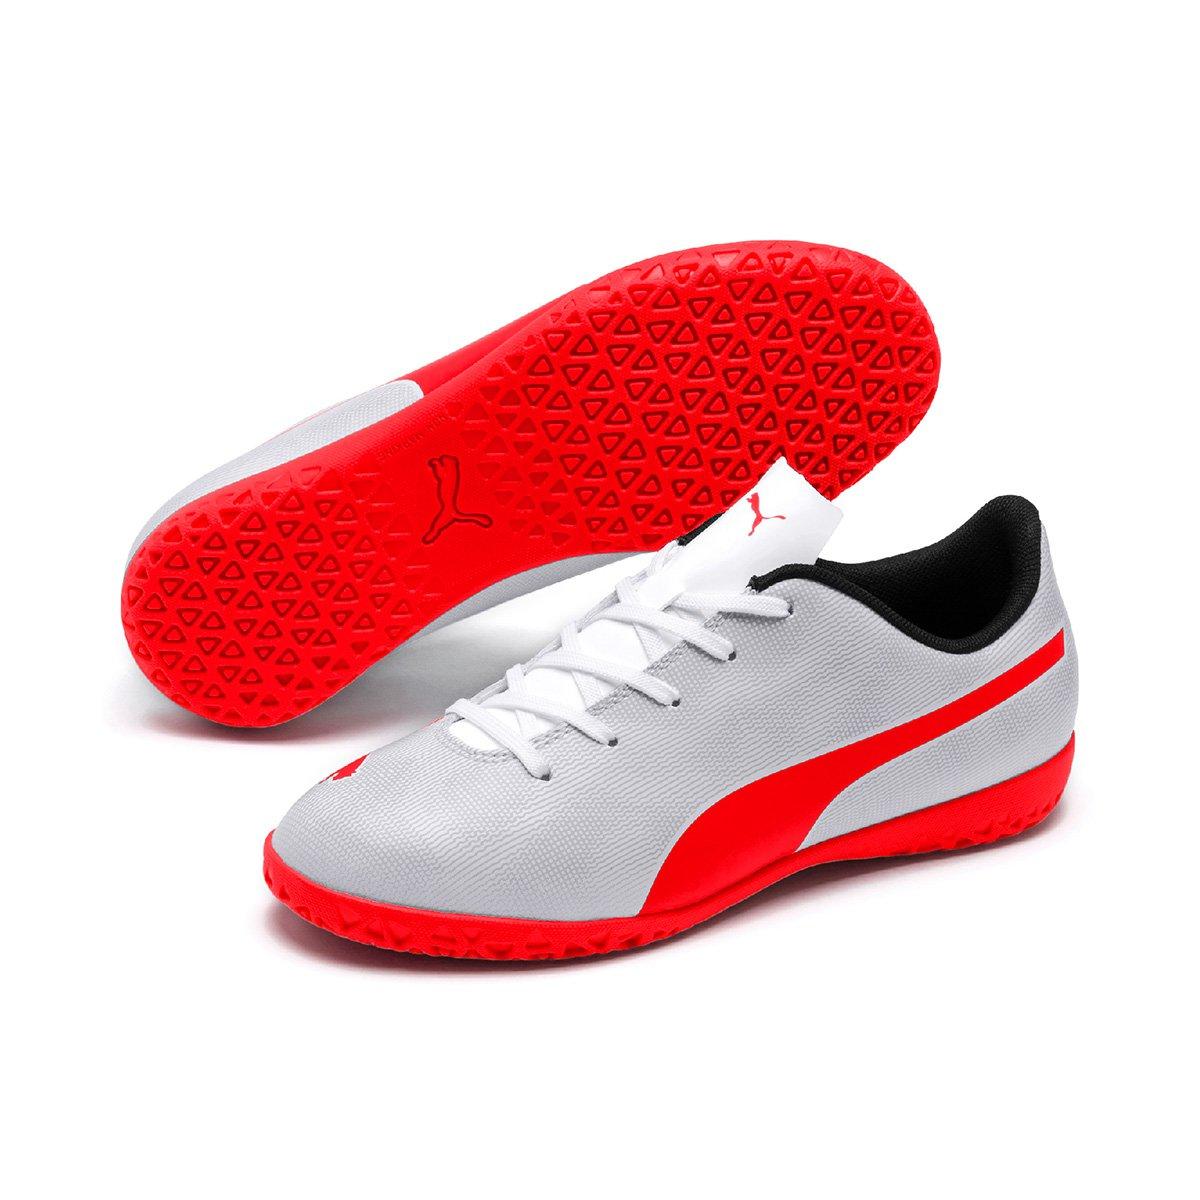 8ecd1d328e Chuteira Futsal Infantil Puma Rapido IT